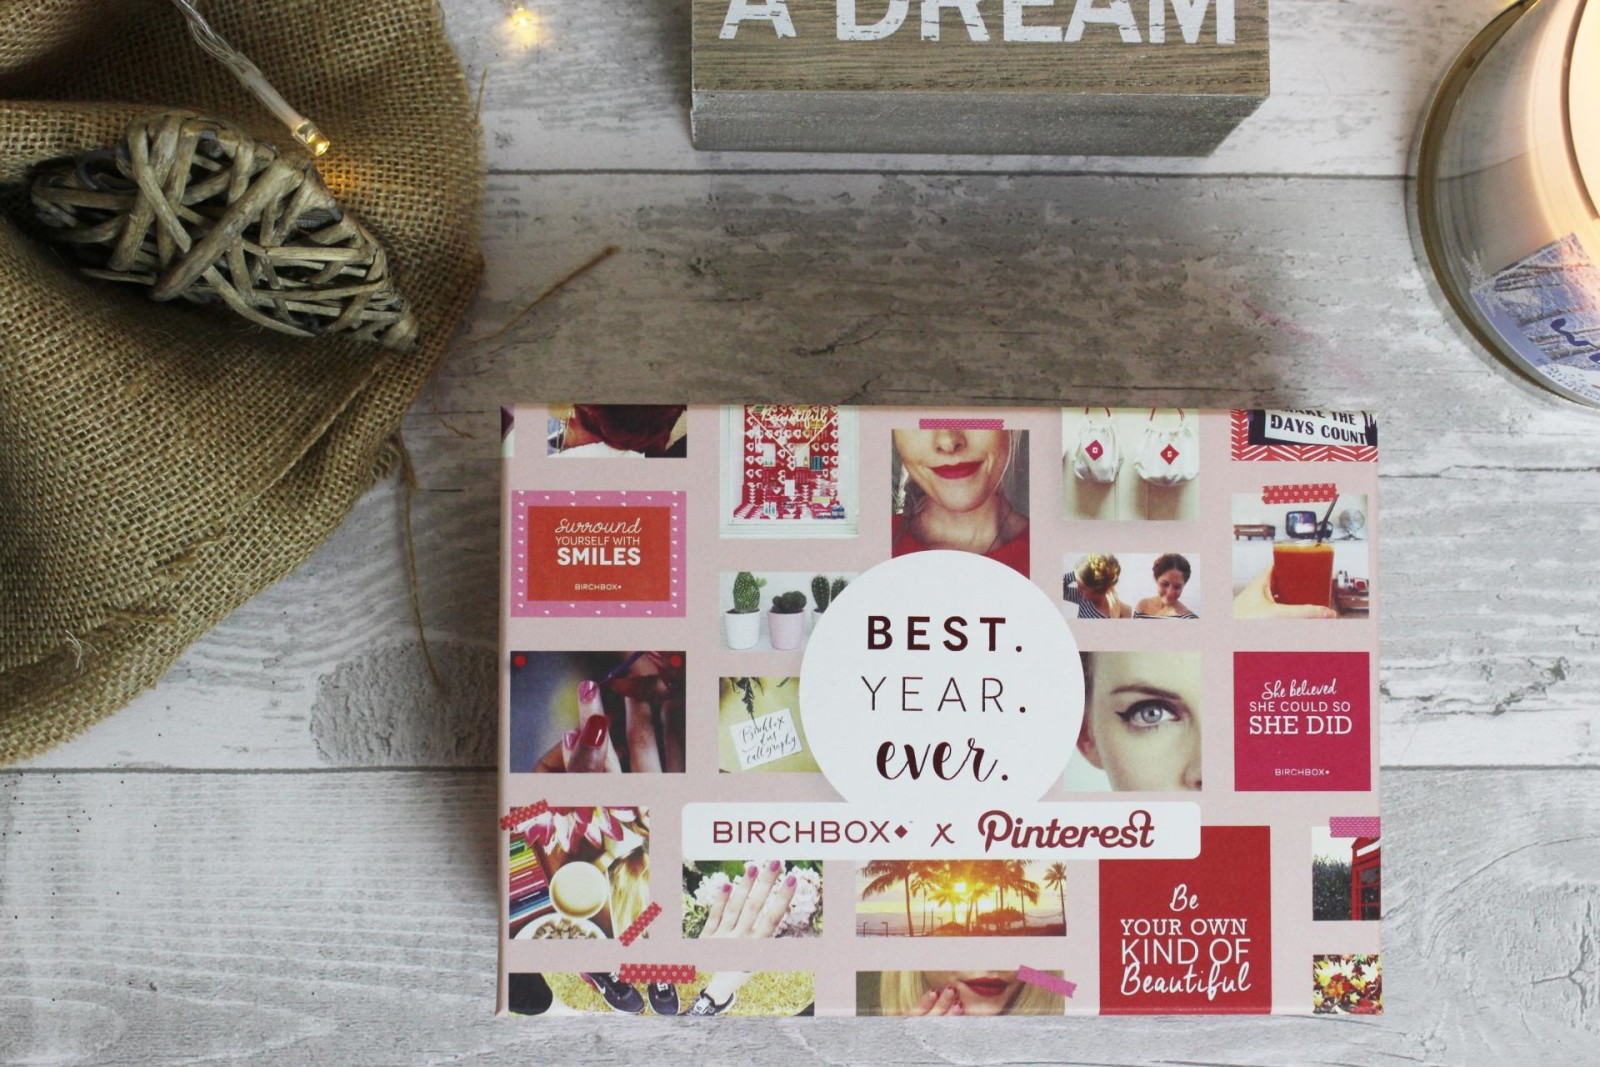 The 2016 January Birchbox x Pinterest